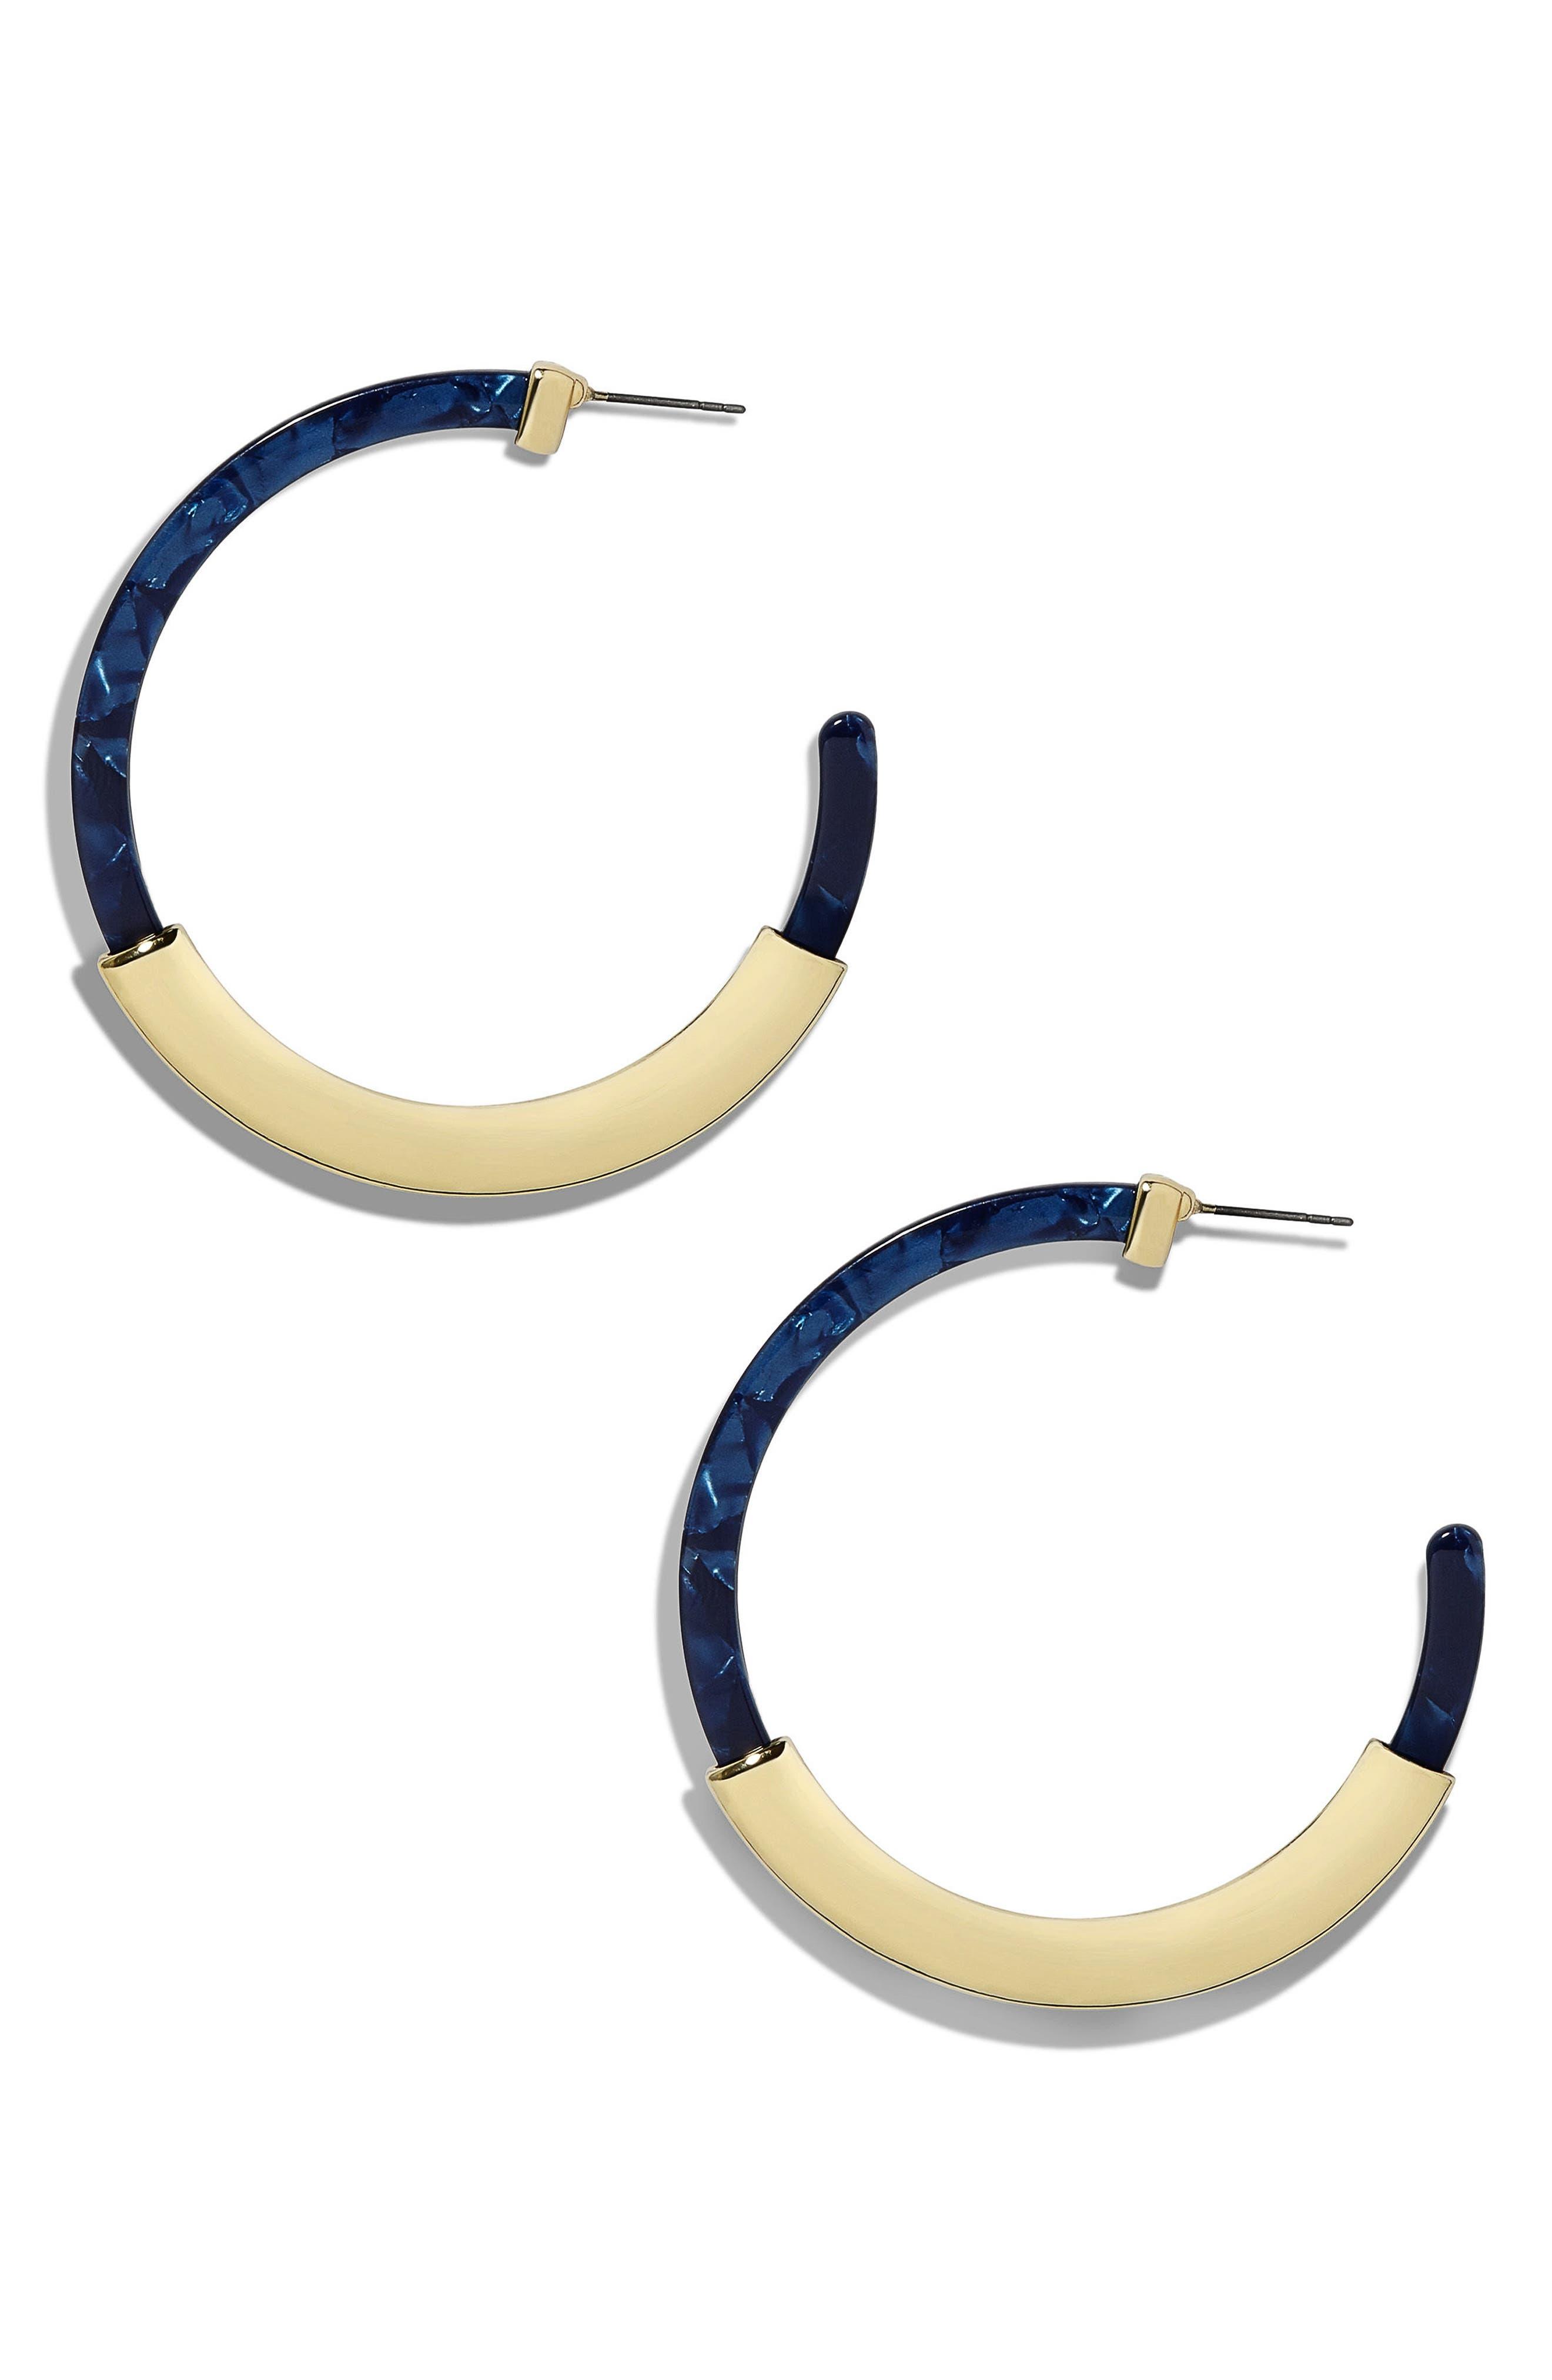 BaubleBar Tassiana Gold & Acrylic Hoop Earrings